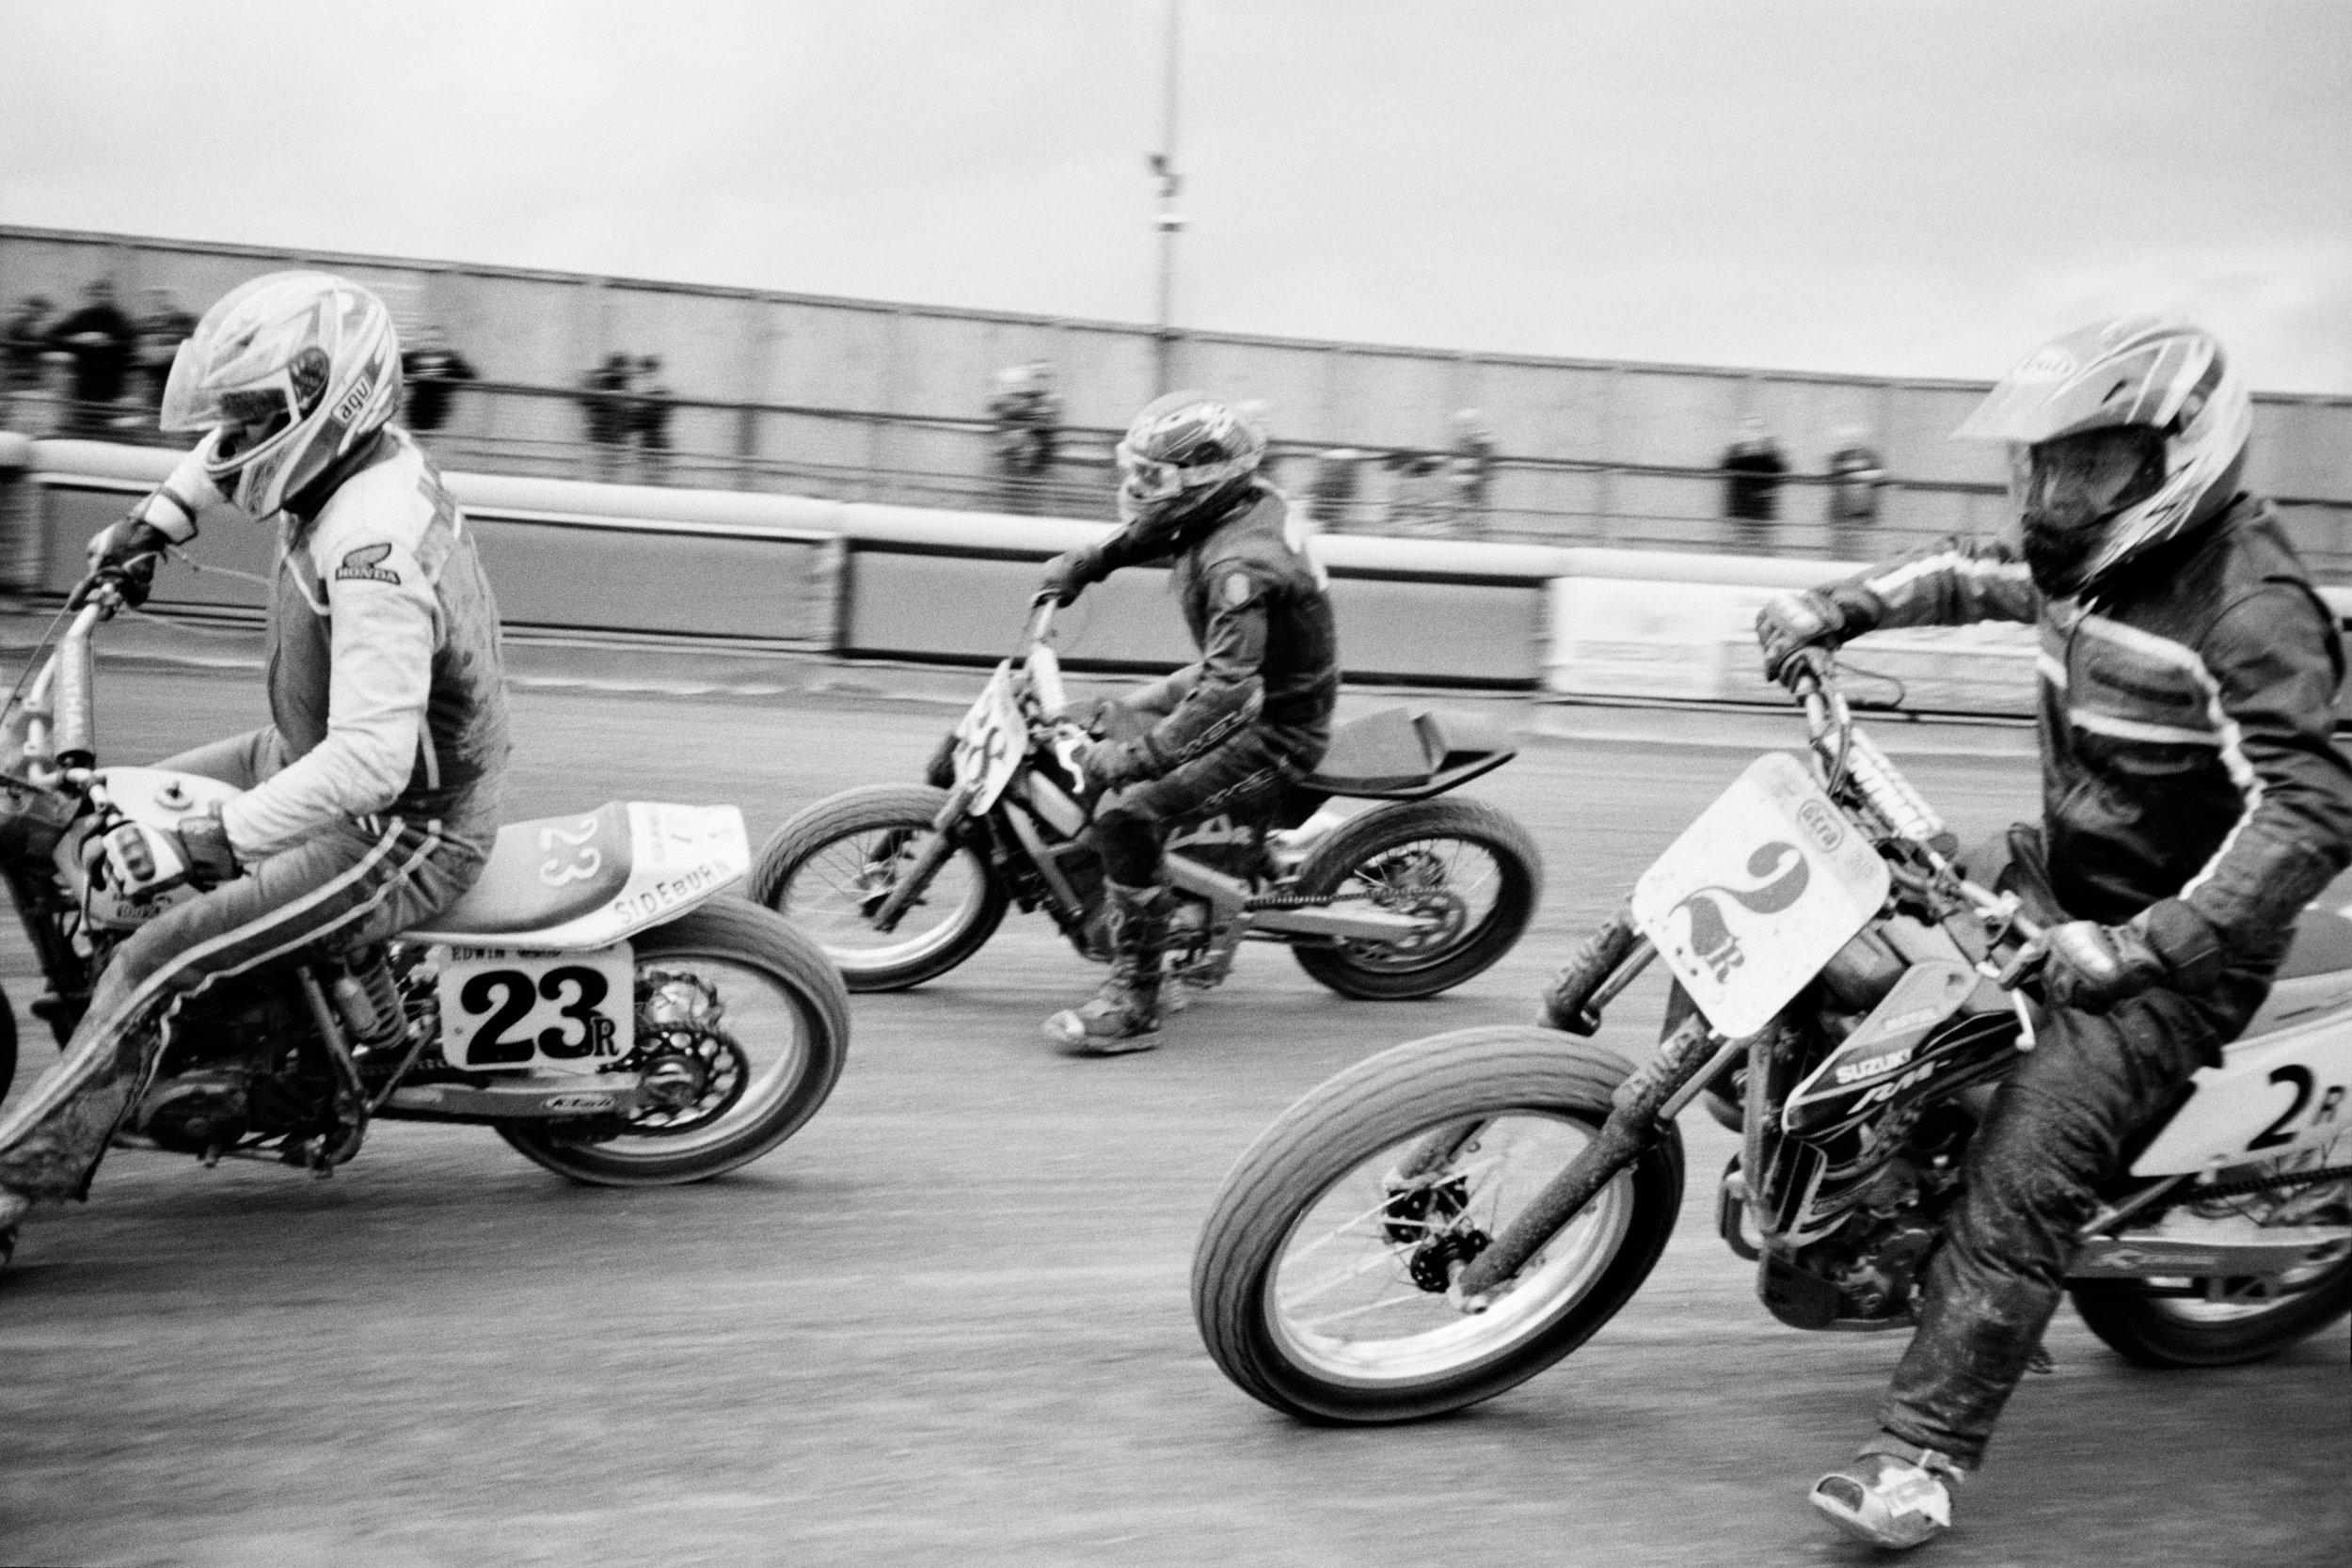 Leicester Speedway - 2014